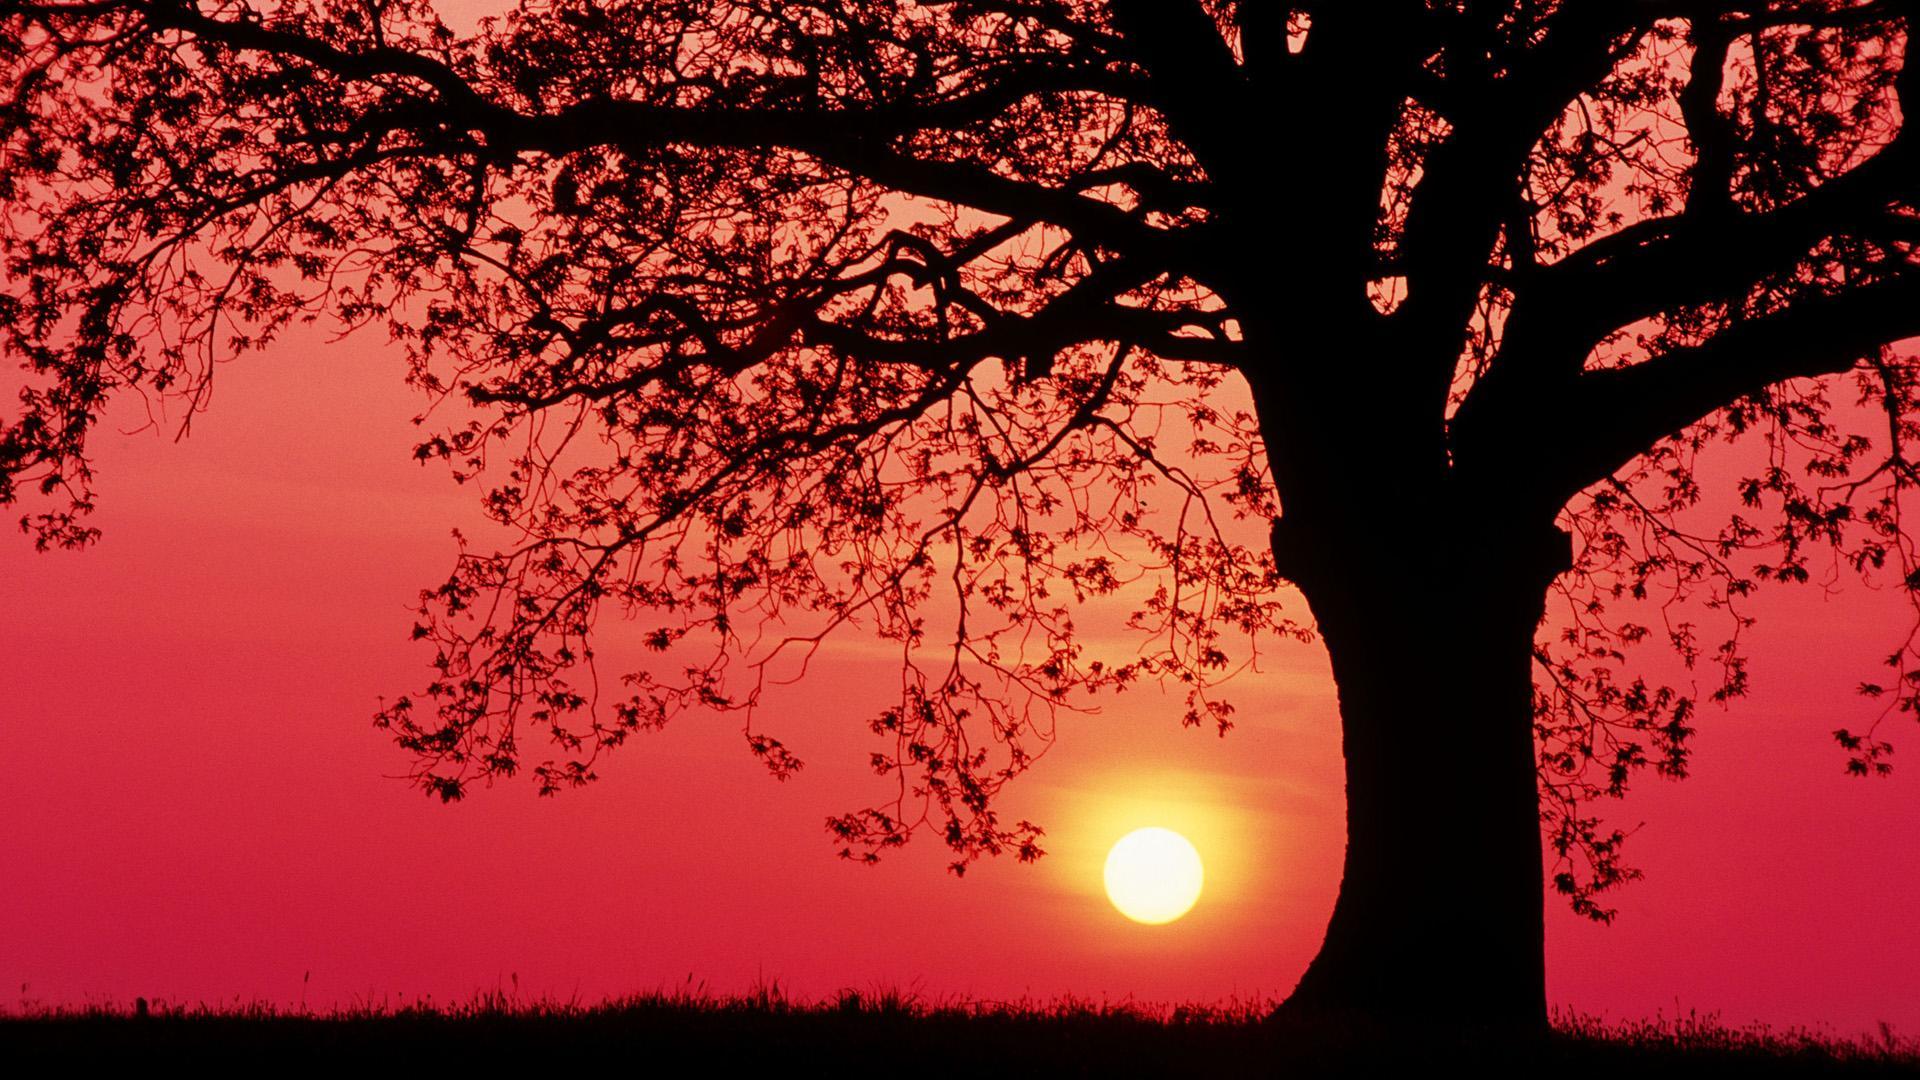 silhouette sunset landscape